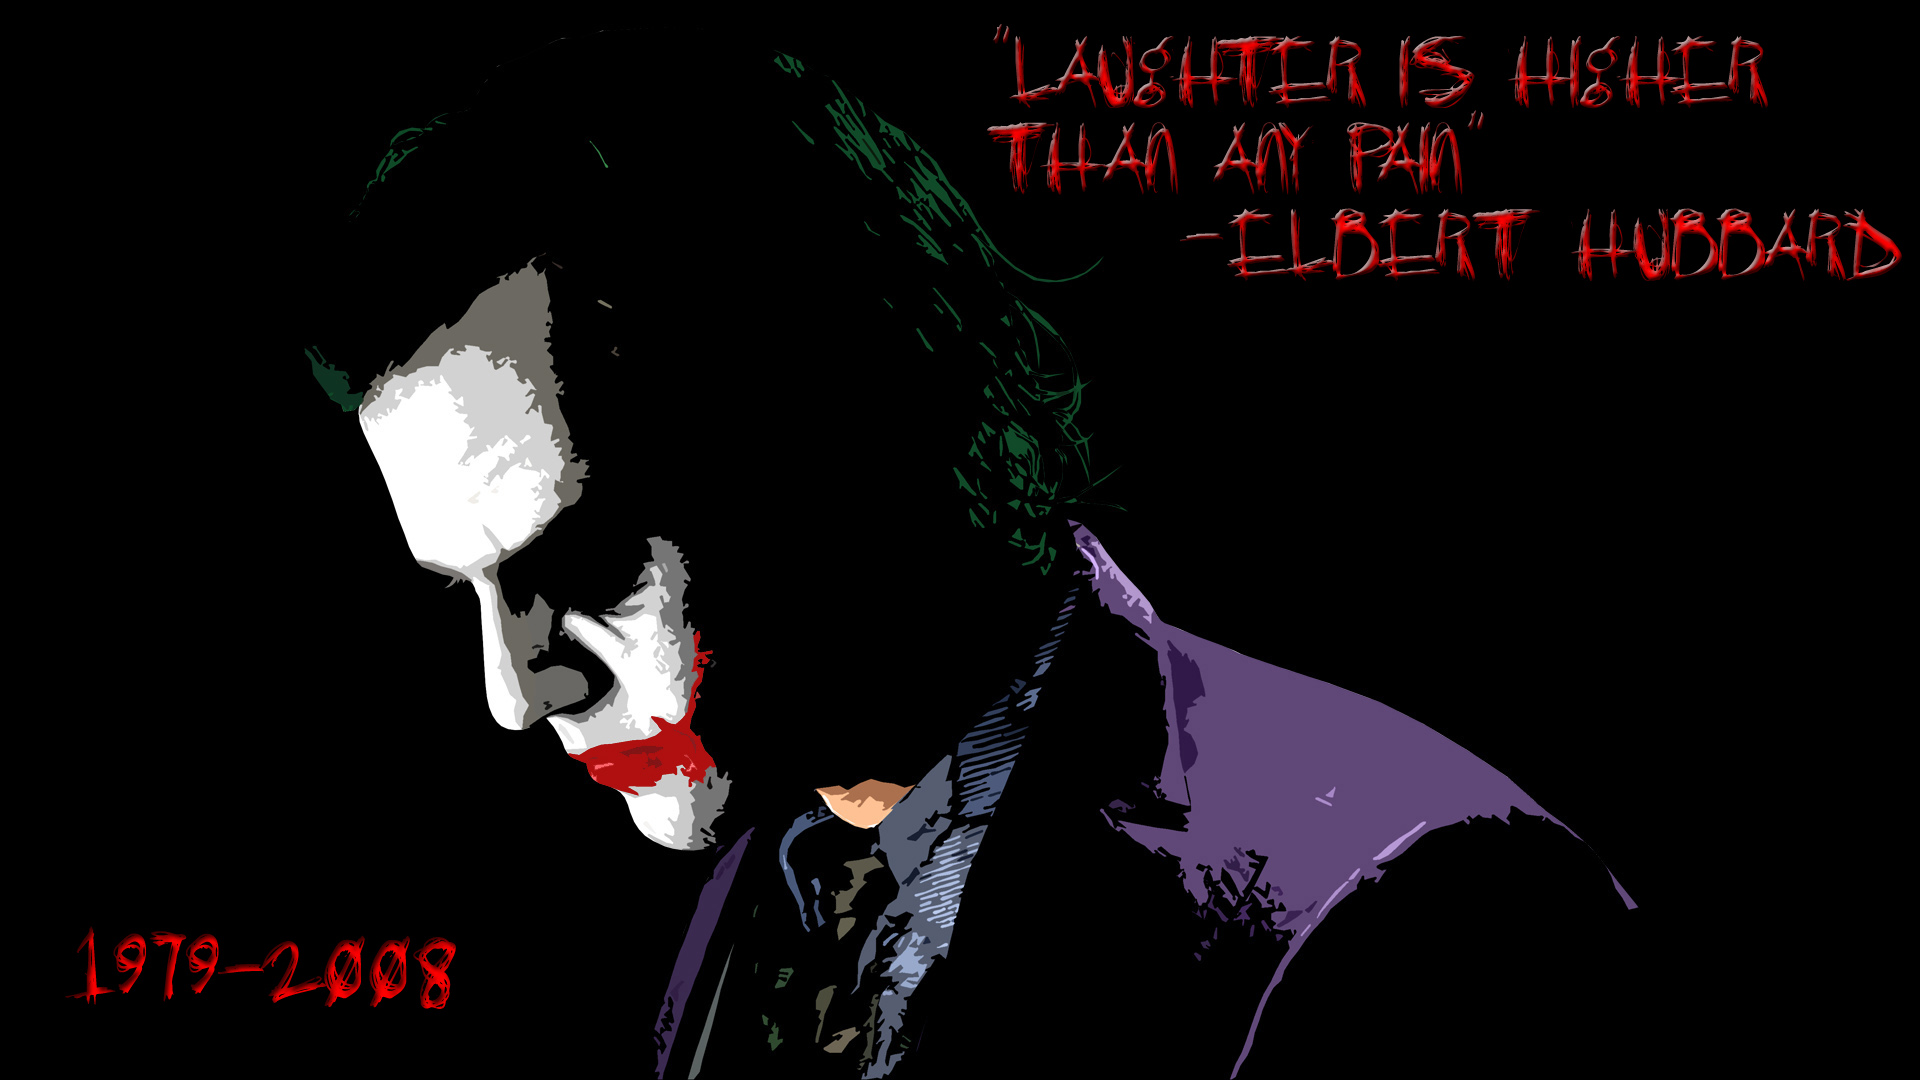 The Joker Wallpaper 1920x1080 The Joker Batman The Dark Knight 1920x1080